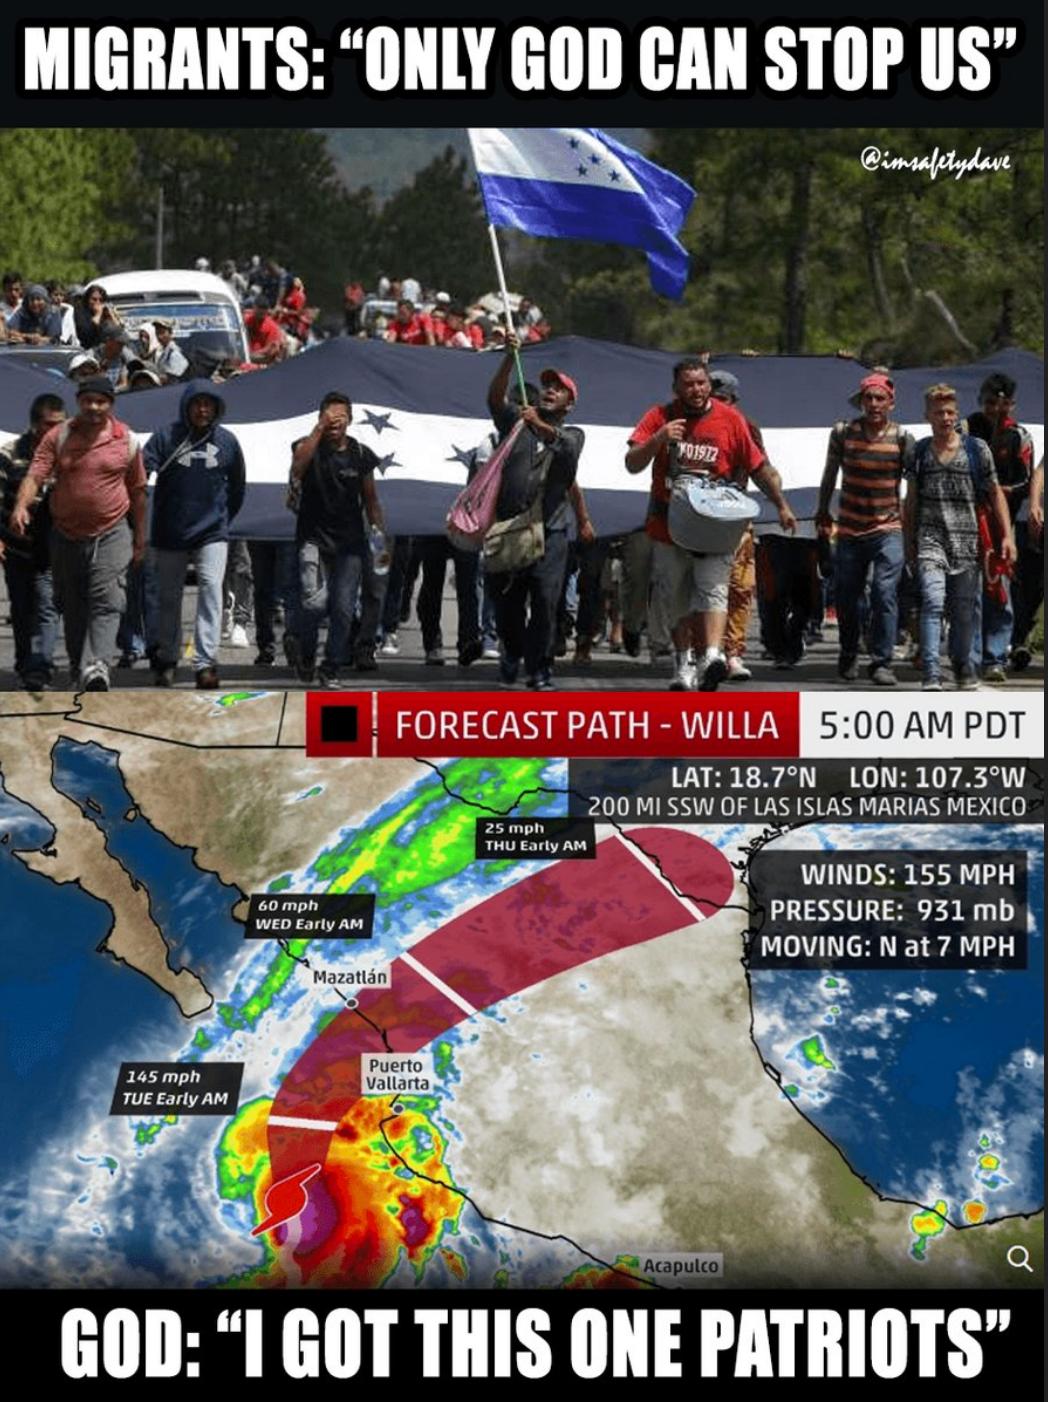 Migrants vs Hurricane